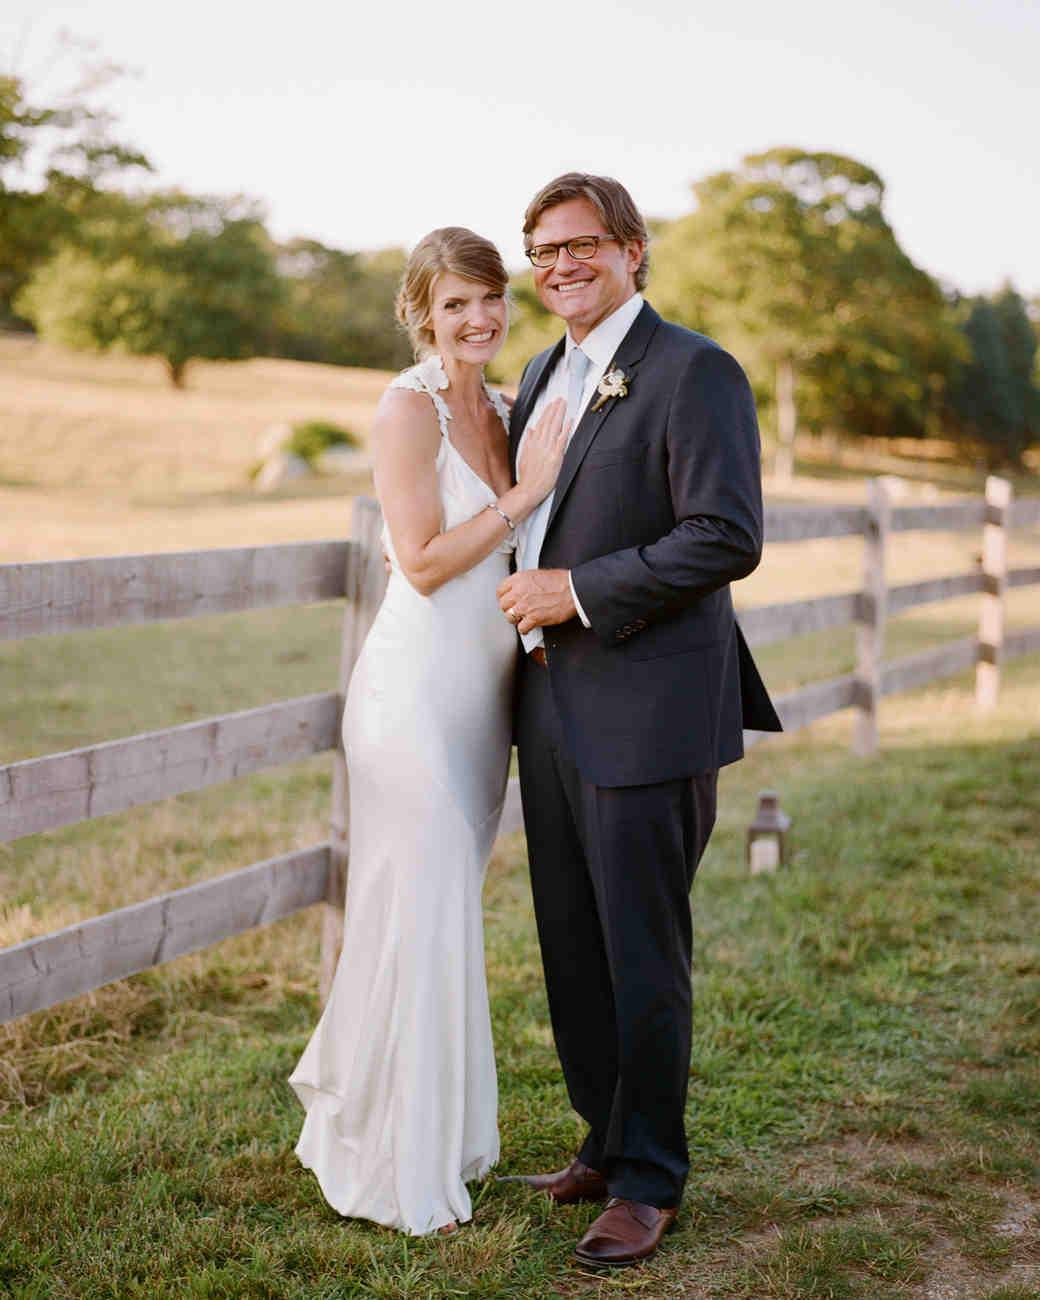 jocelyn-graham-wedding-couple-1192-s111847-0315.jpg